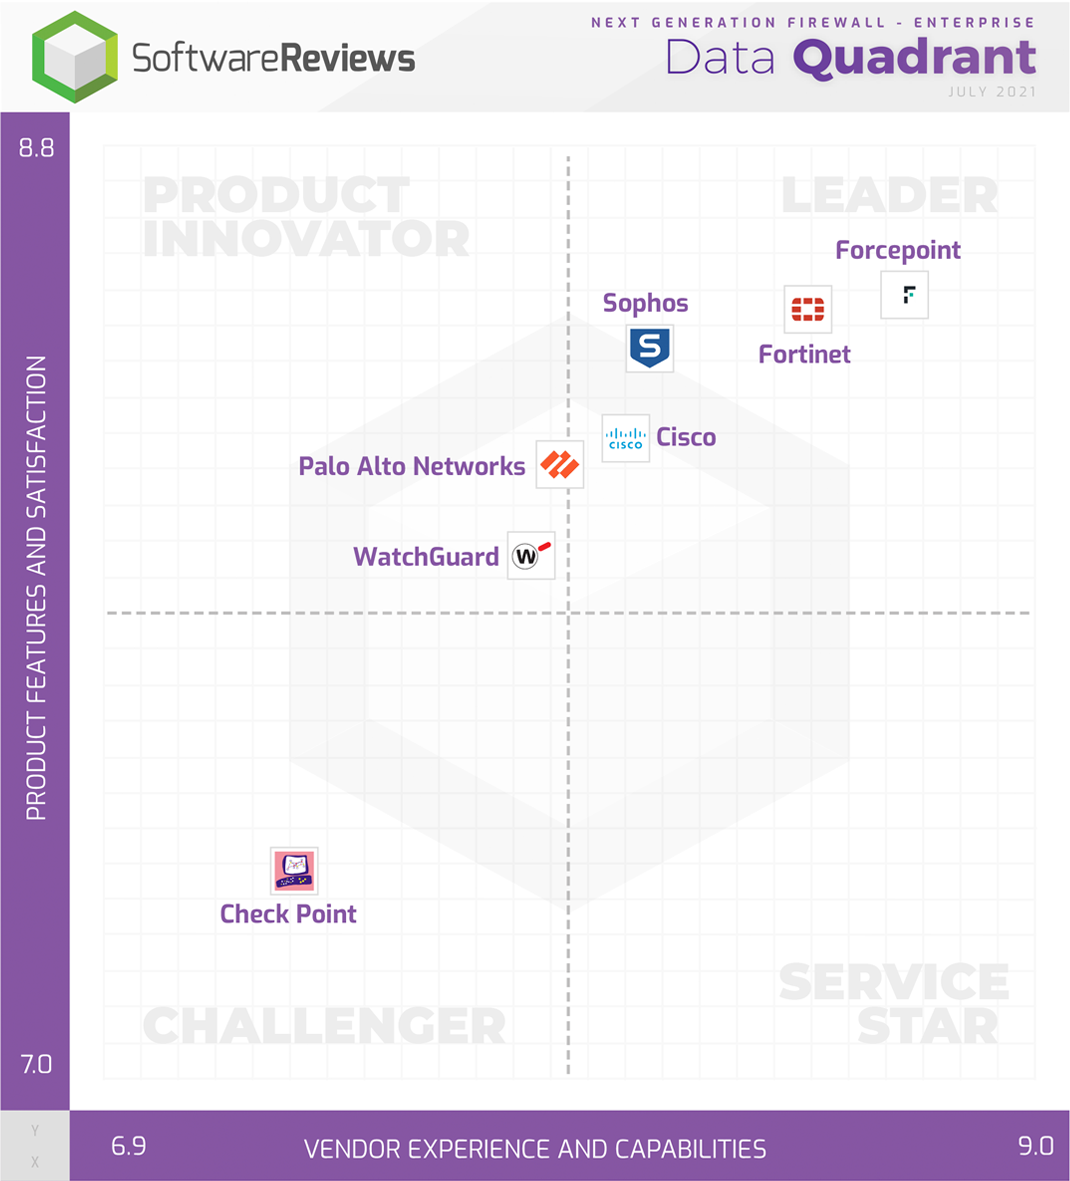 Next Generation Firewall - Enterprise Data Quadrant